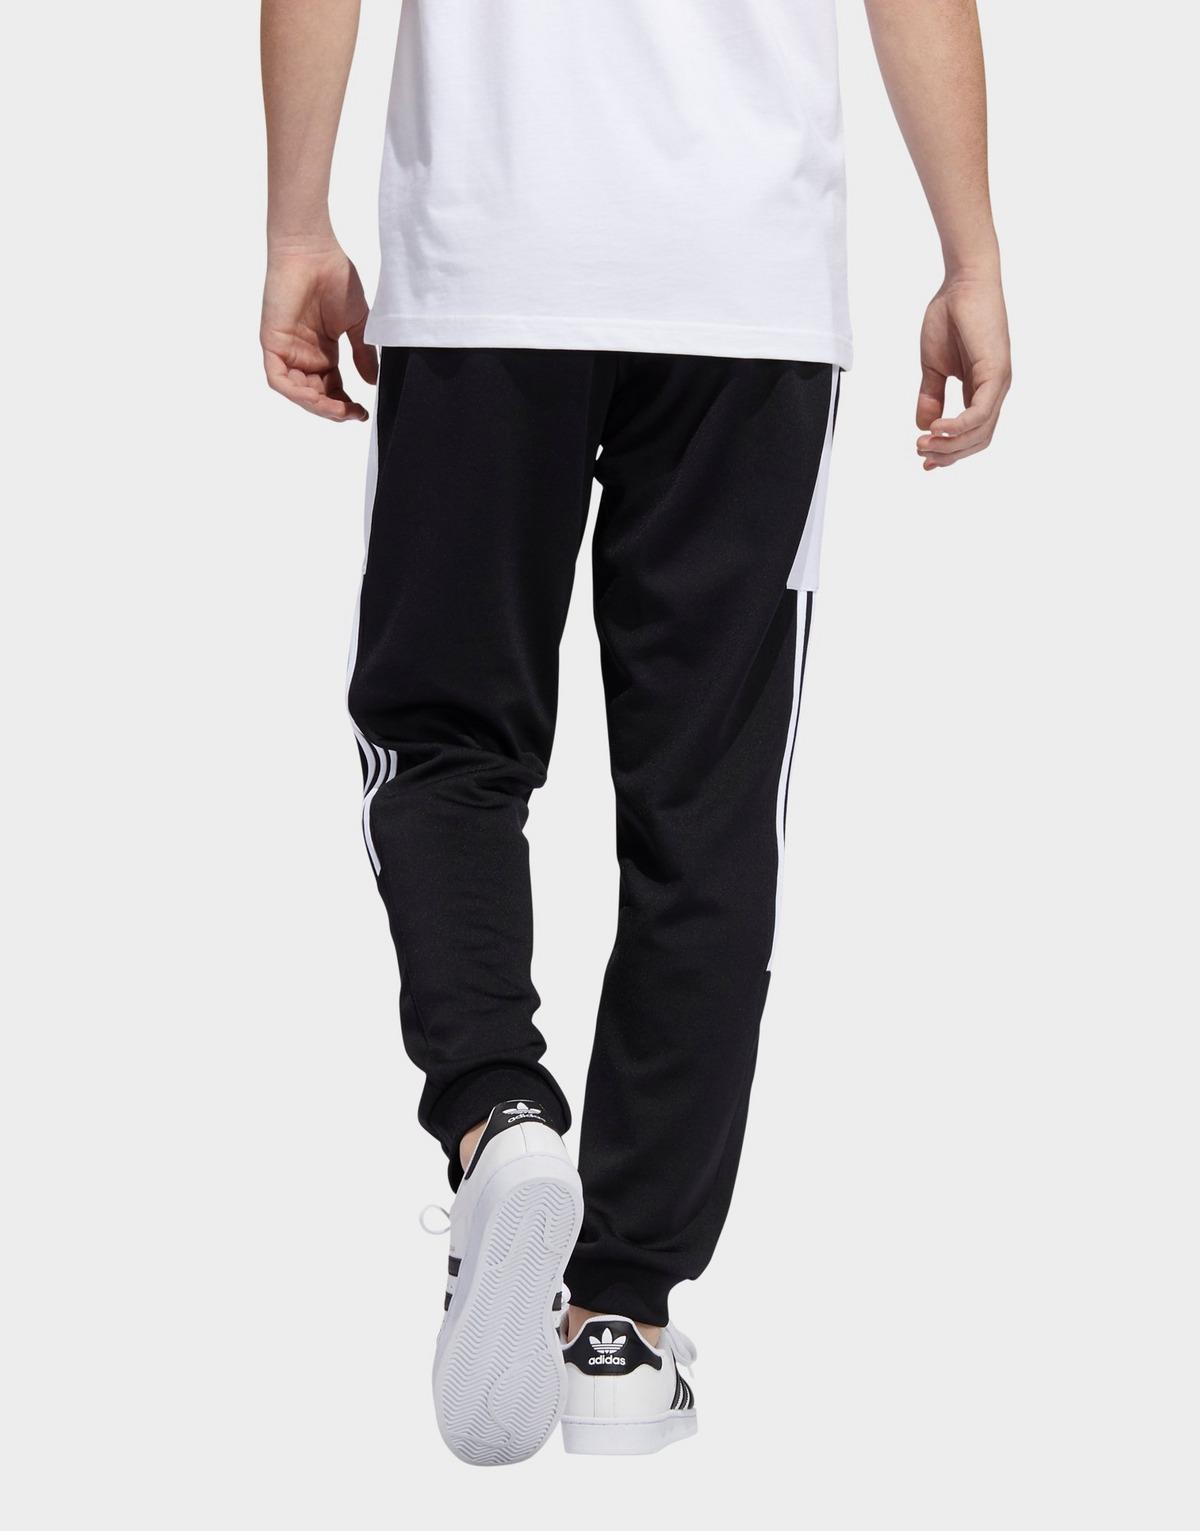 Adidas Originals Classics Tracksuit Bottoms